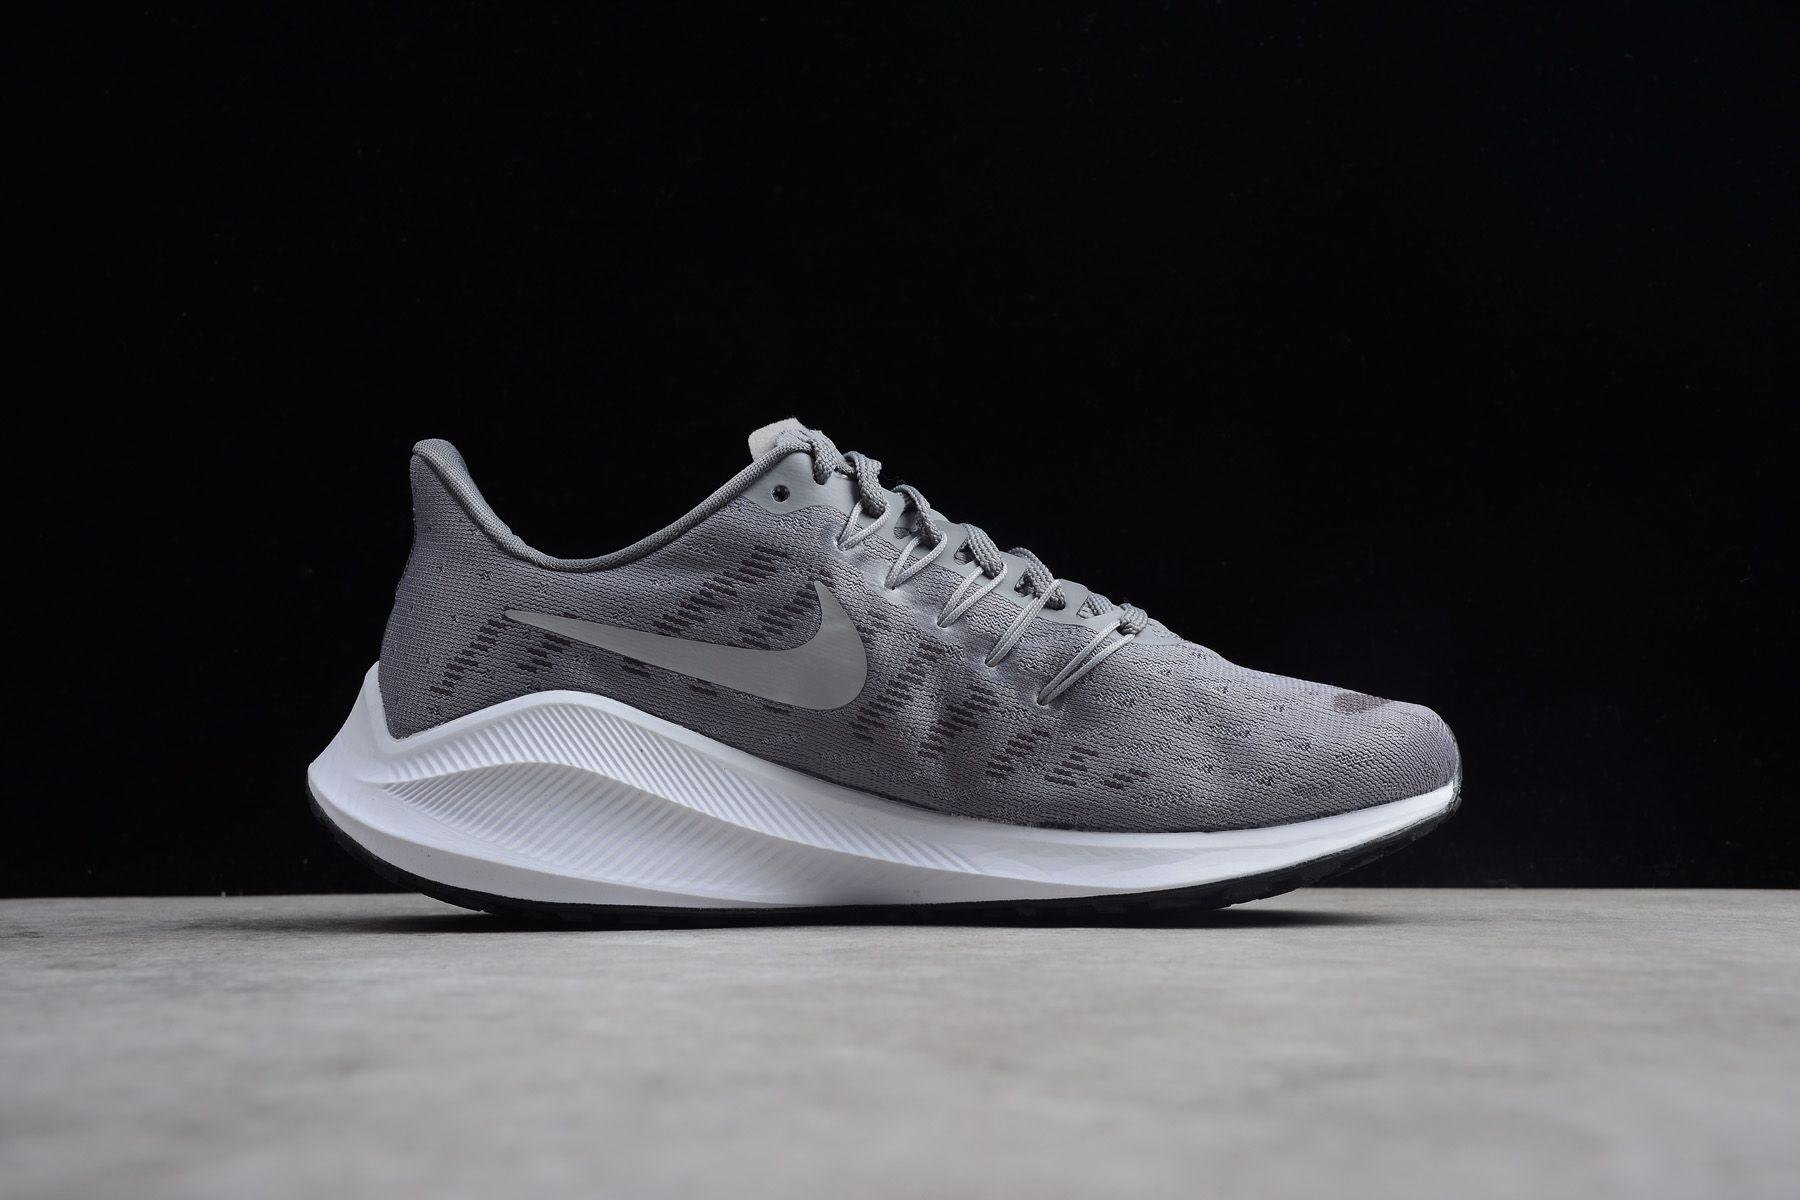 Nike Air Zoom Vomero 14 Grey White Running Shoes AH7858 001